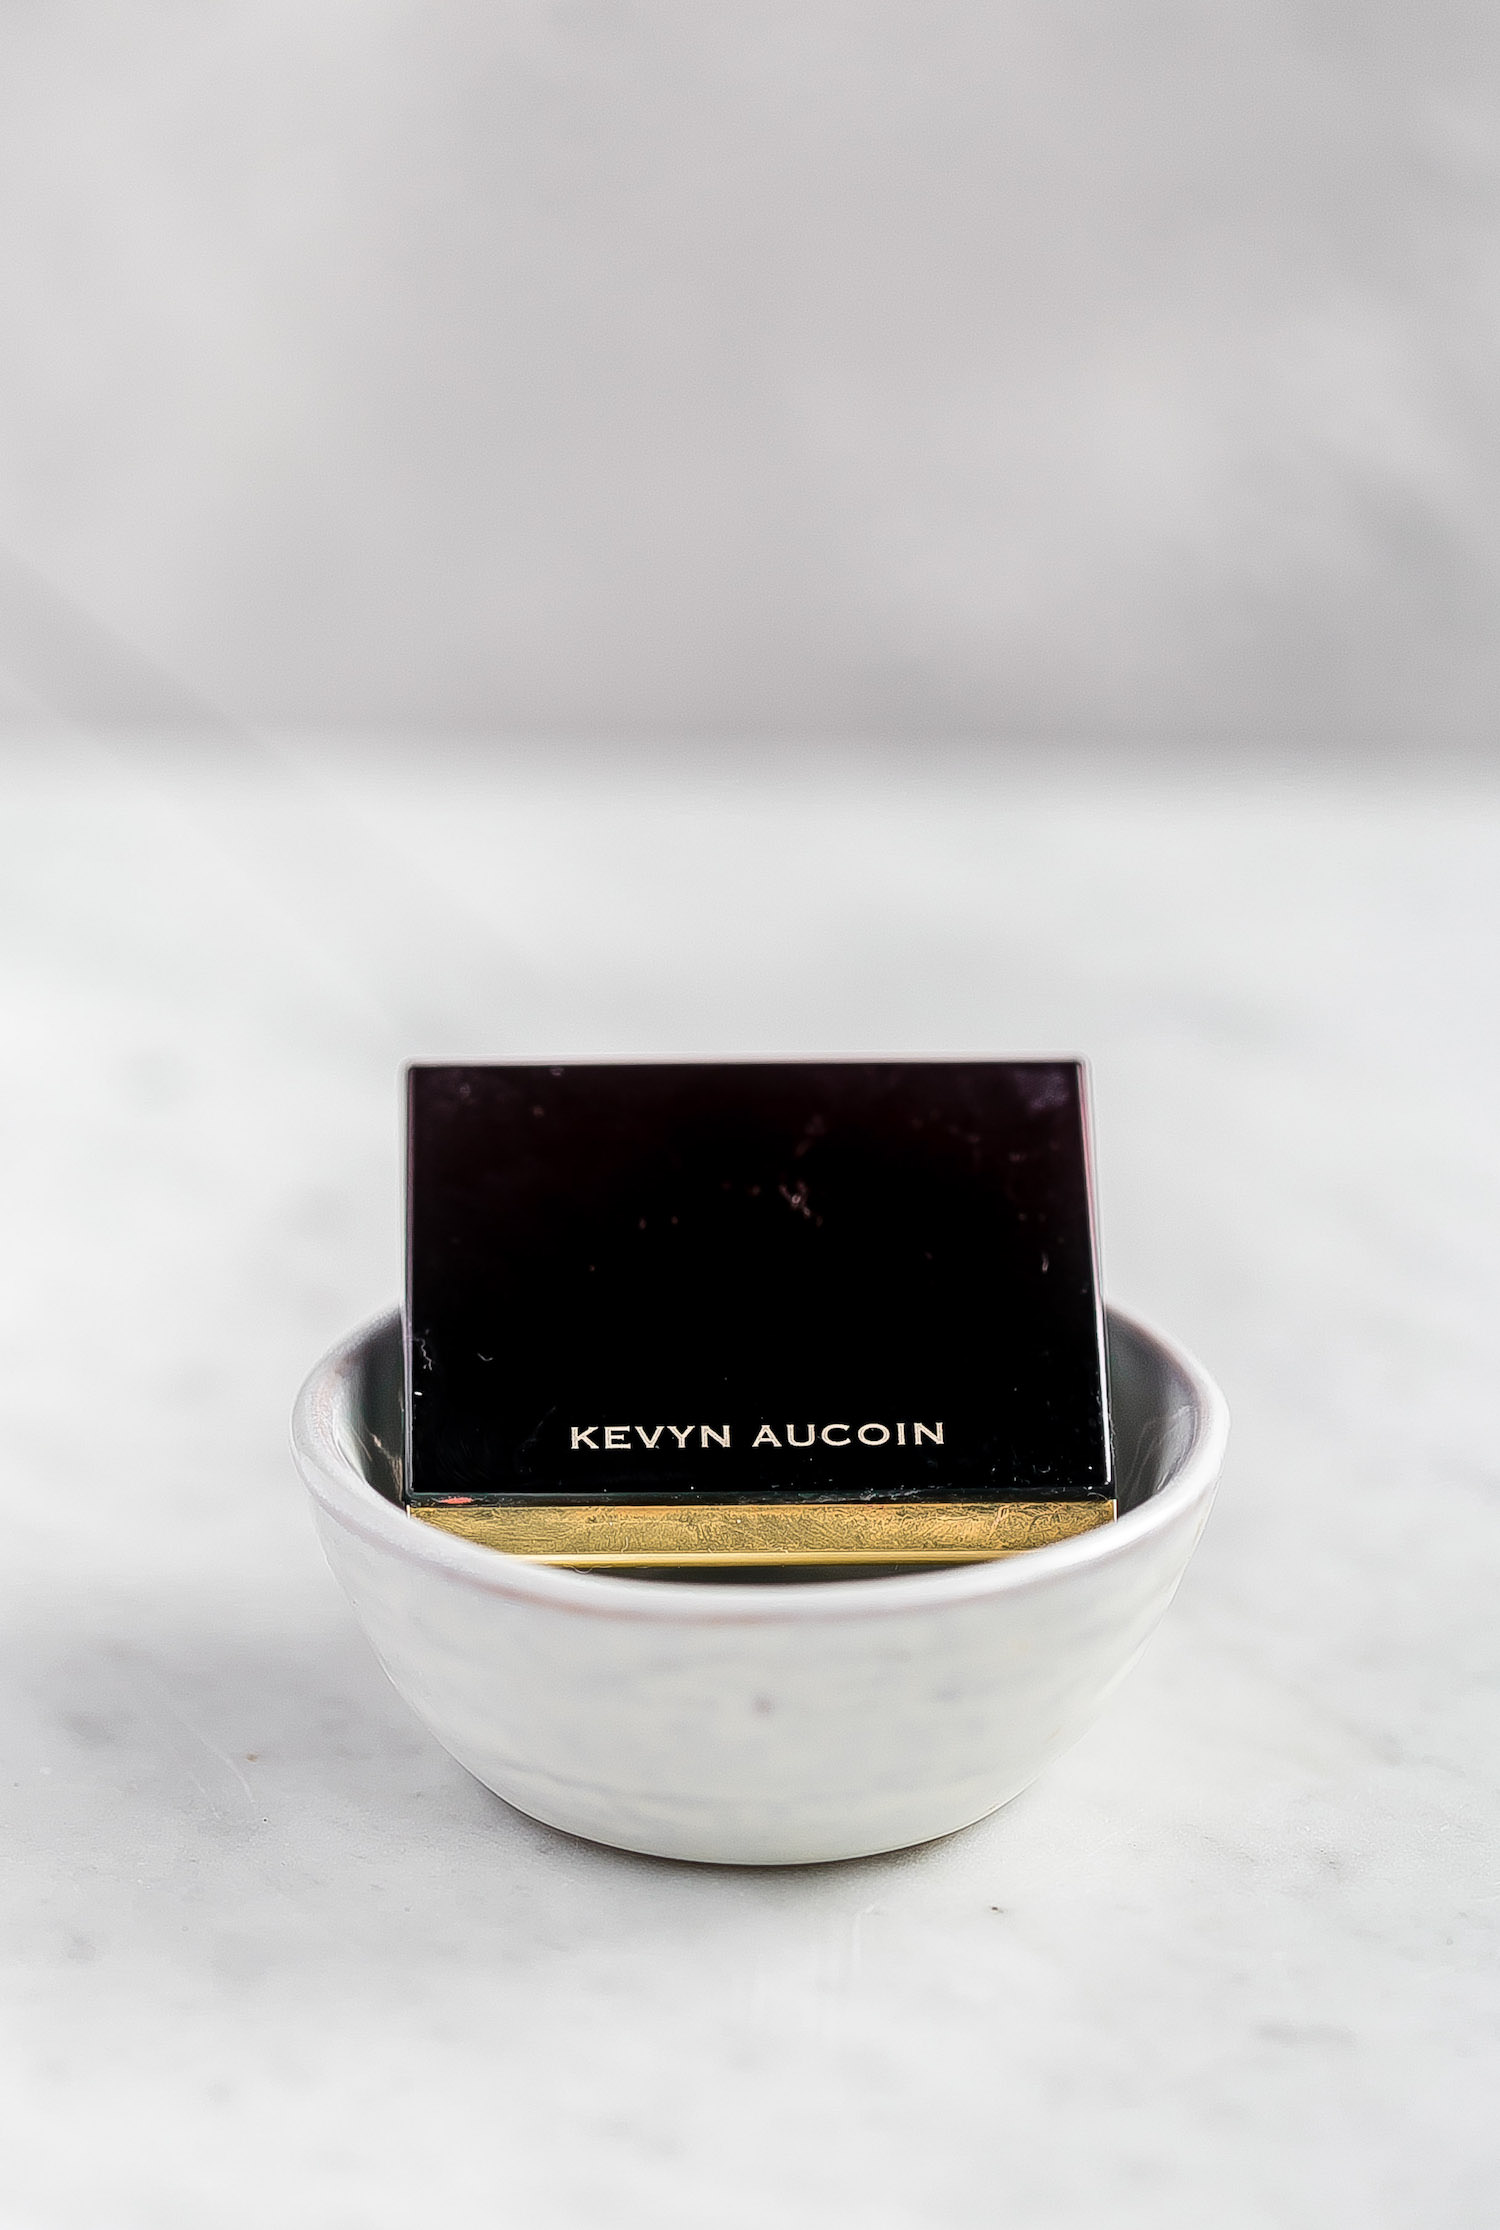 New Favorite Makeup Purchases | TrufflesandTrends.com